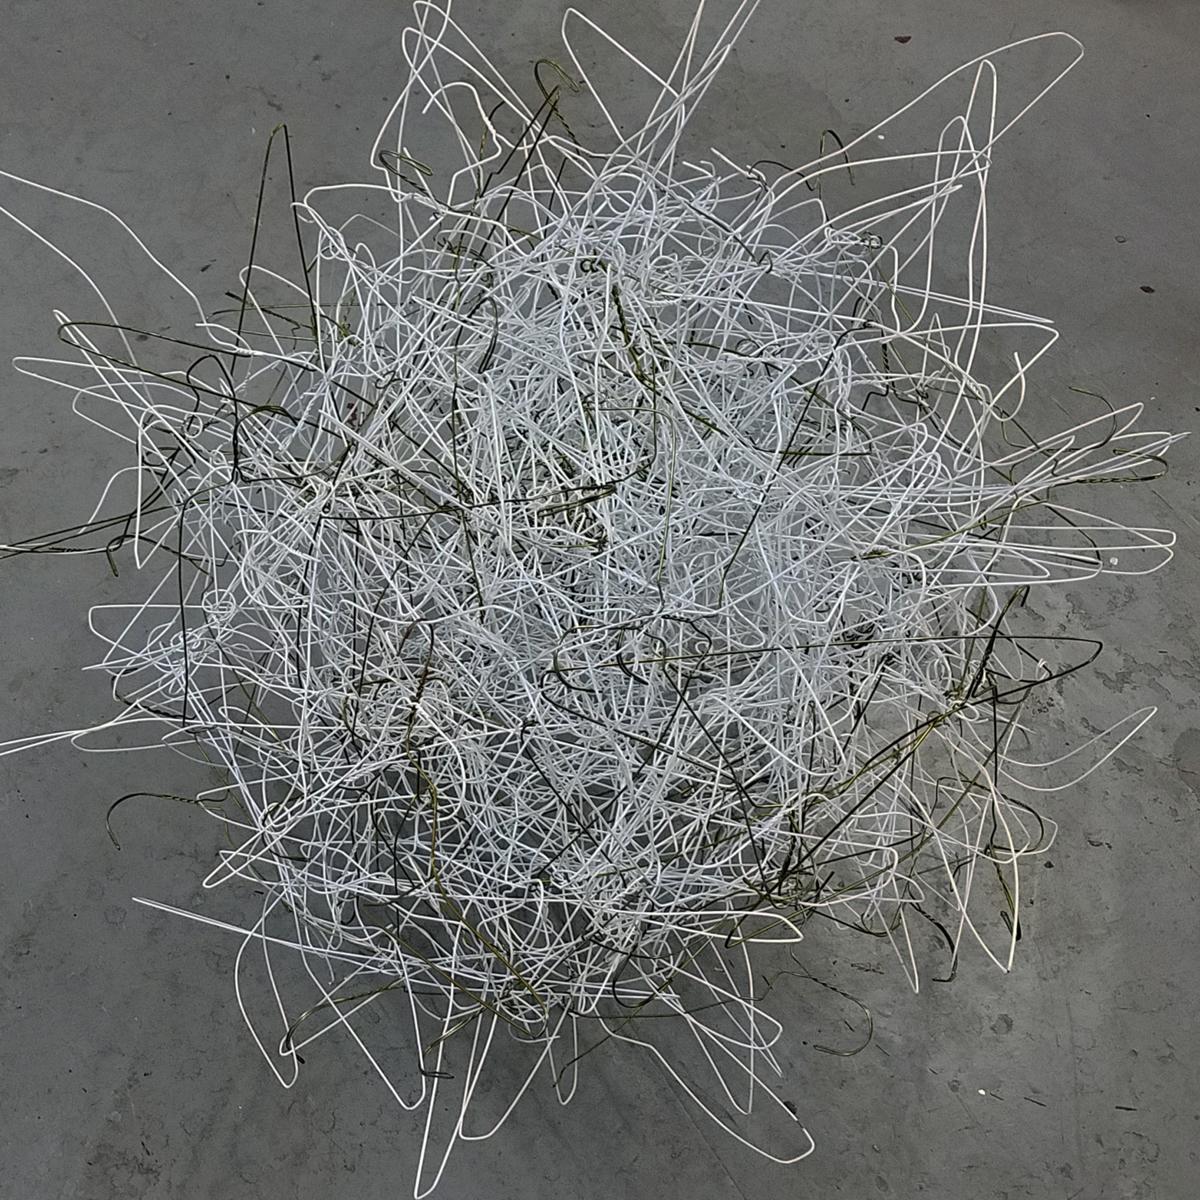 hangered, family debris (large view)